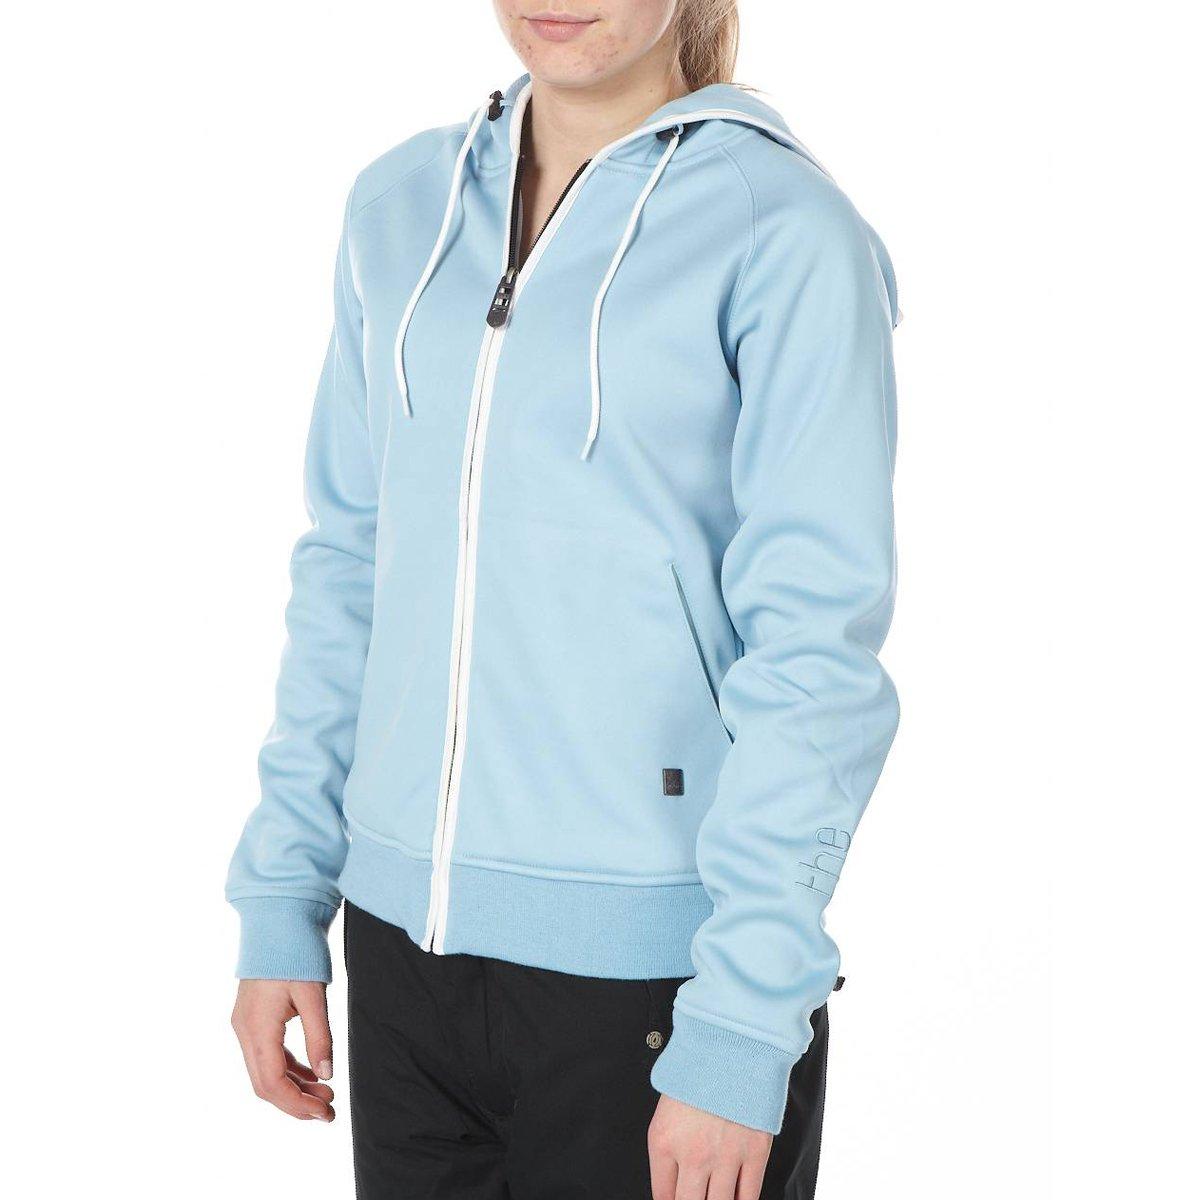 L color LIGHT Forro de esquí para mujer Cream talla azul/blanco LSDLBF0113